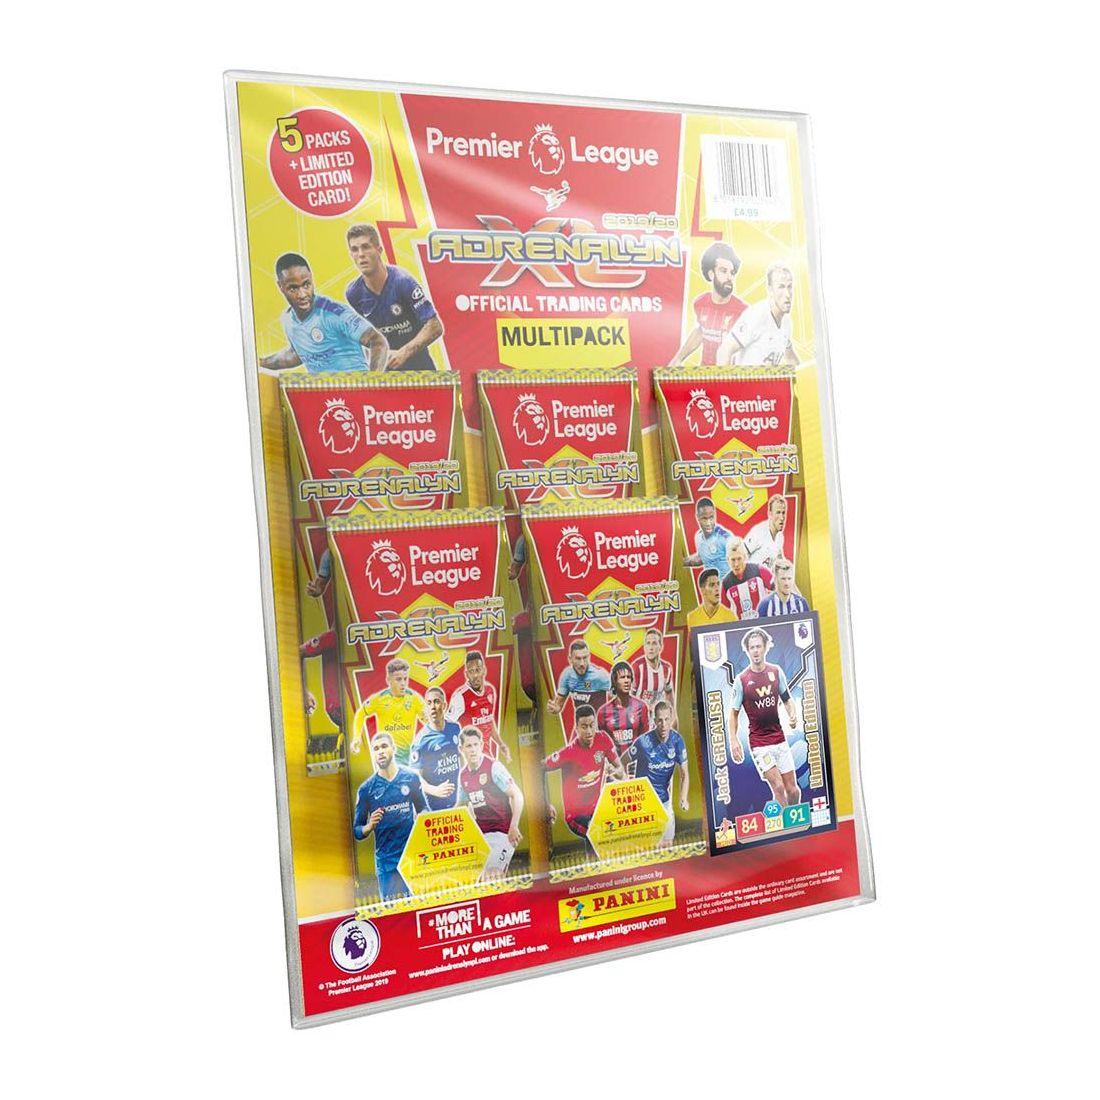 Panini Premier League Adrenalyn XL 19/20 Multipack [Includes 5 Sticker Packs]